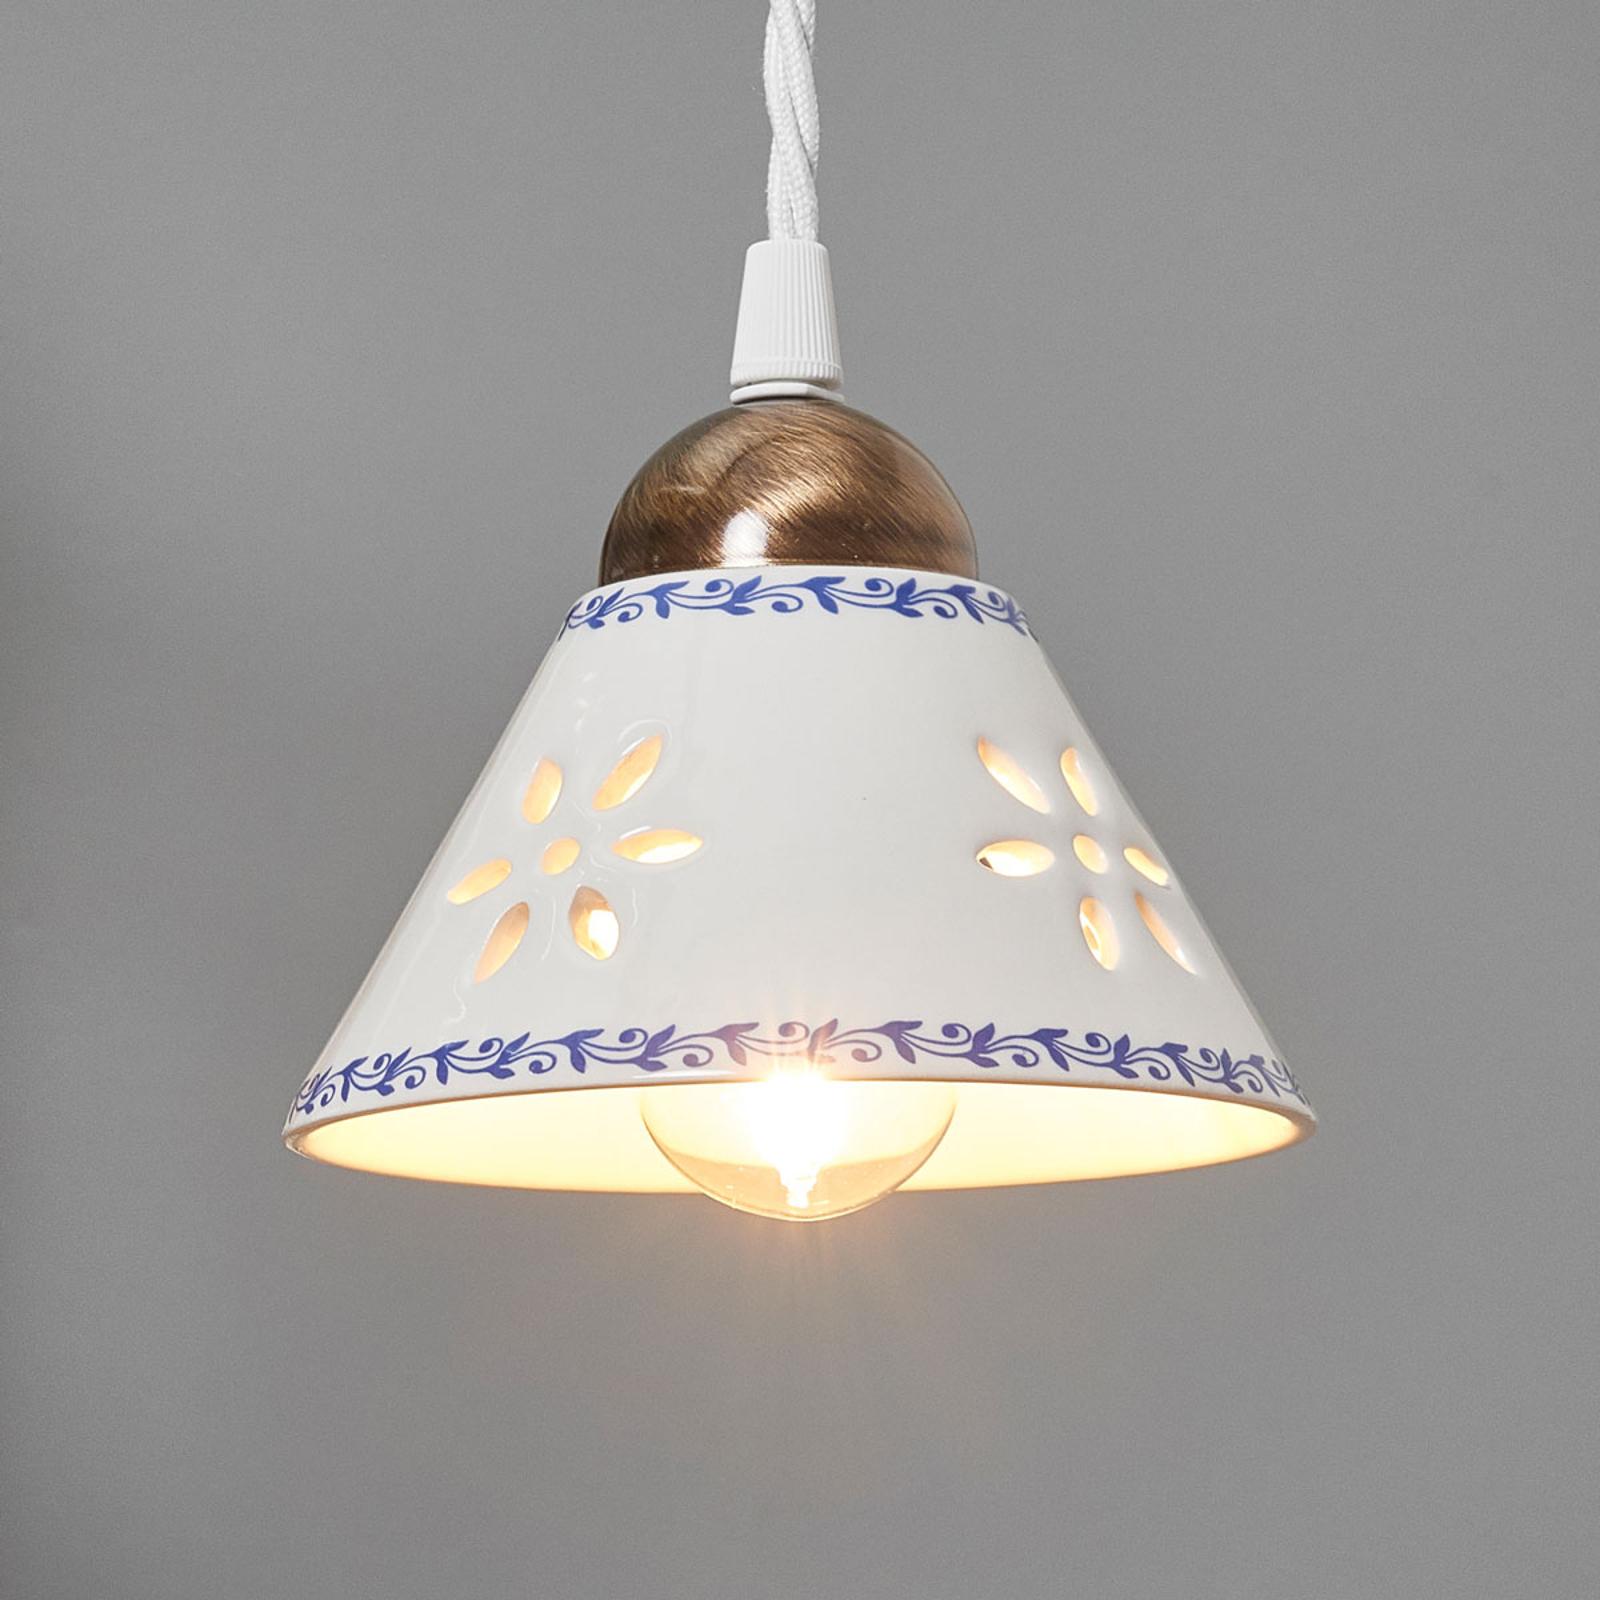 Hanglamp NONNA van wit keramiek